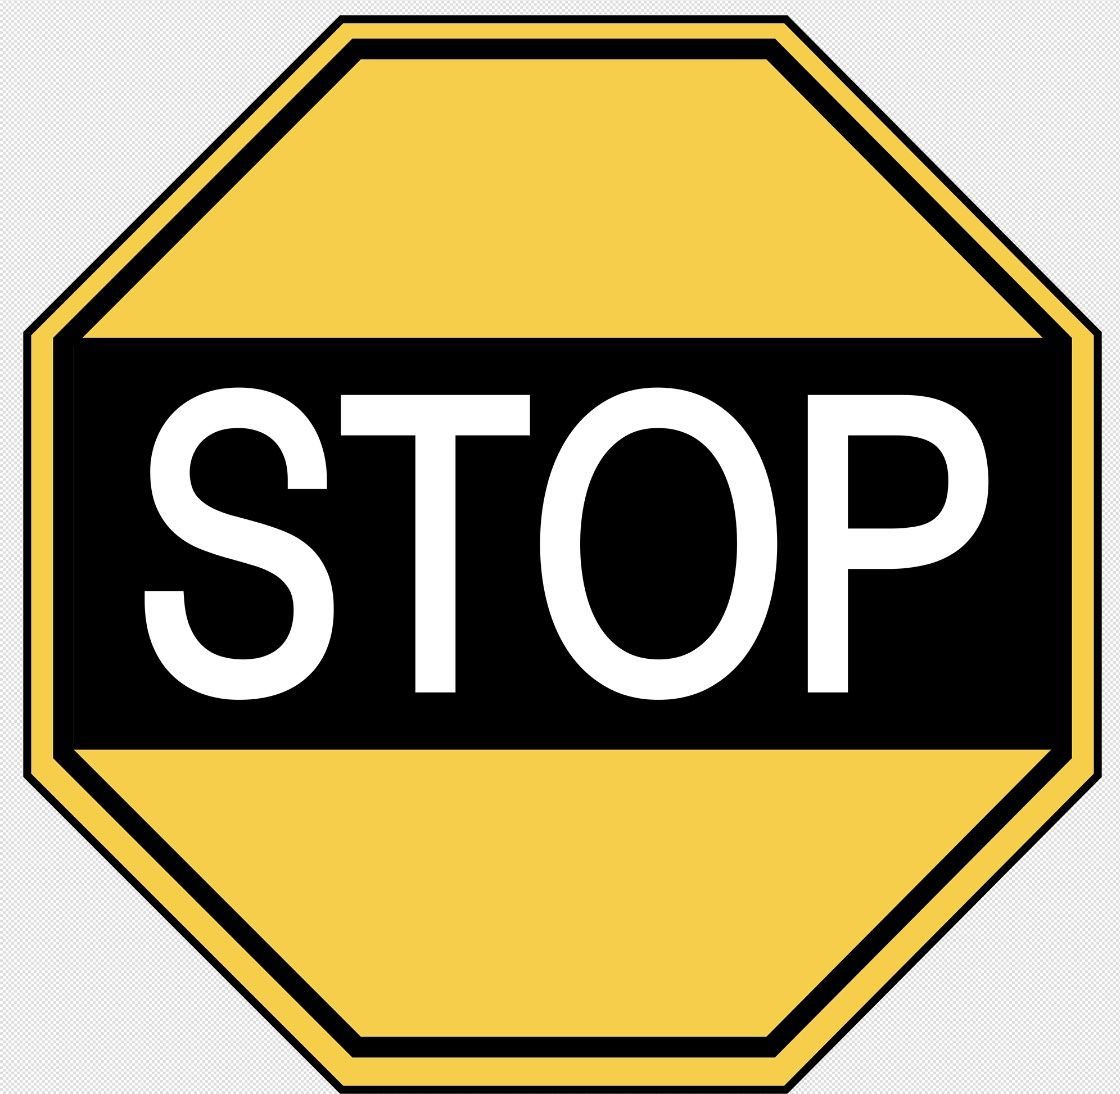 Australian yellow vintage stop sign 19561964 stop sign